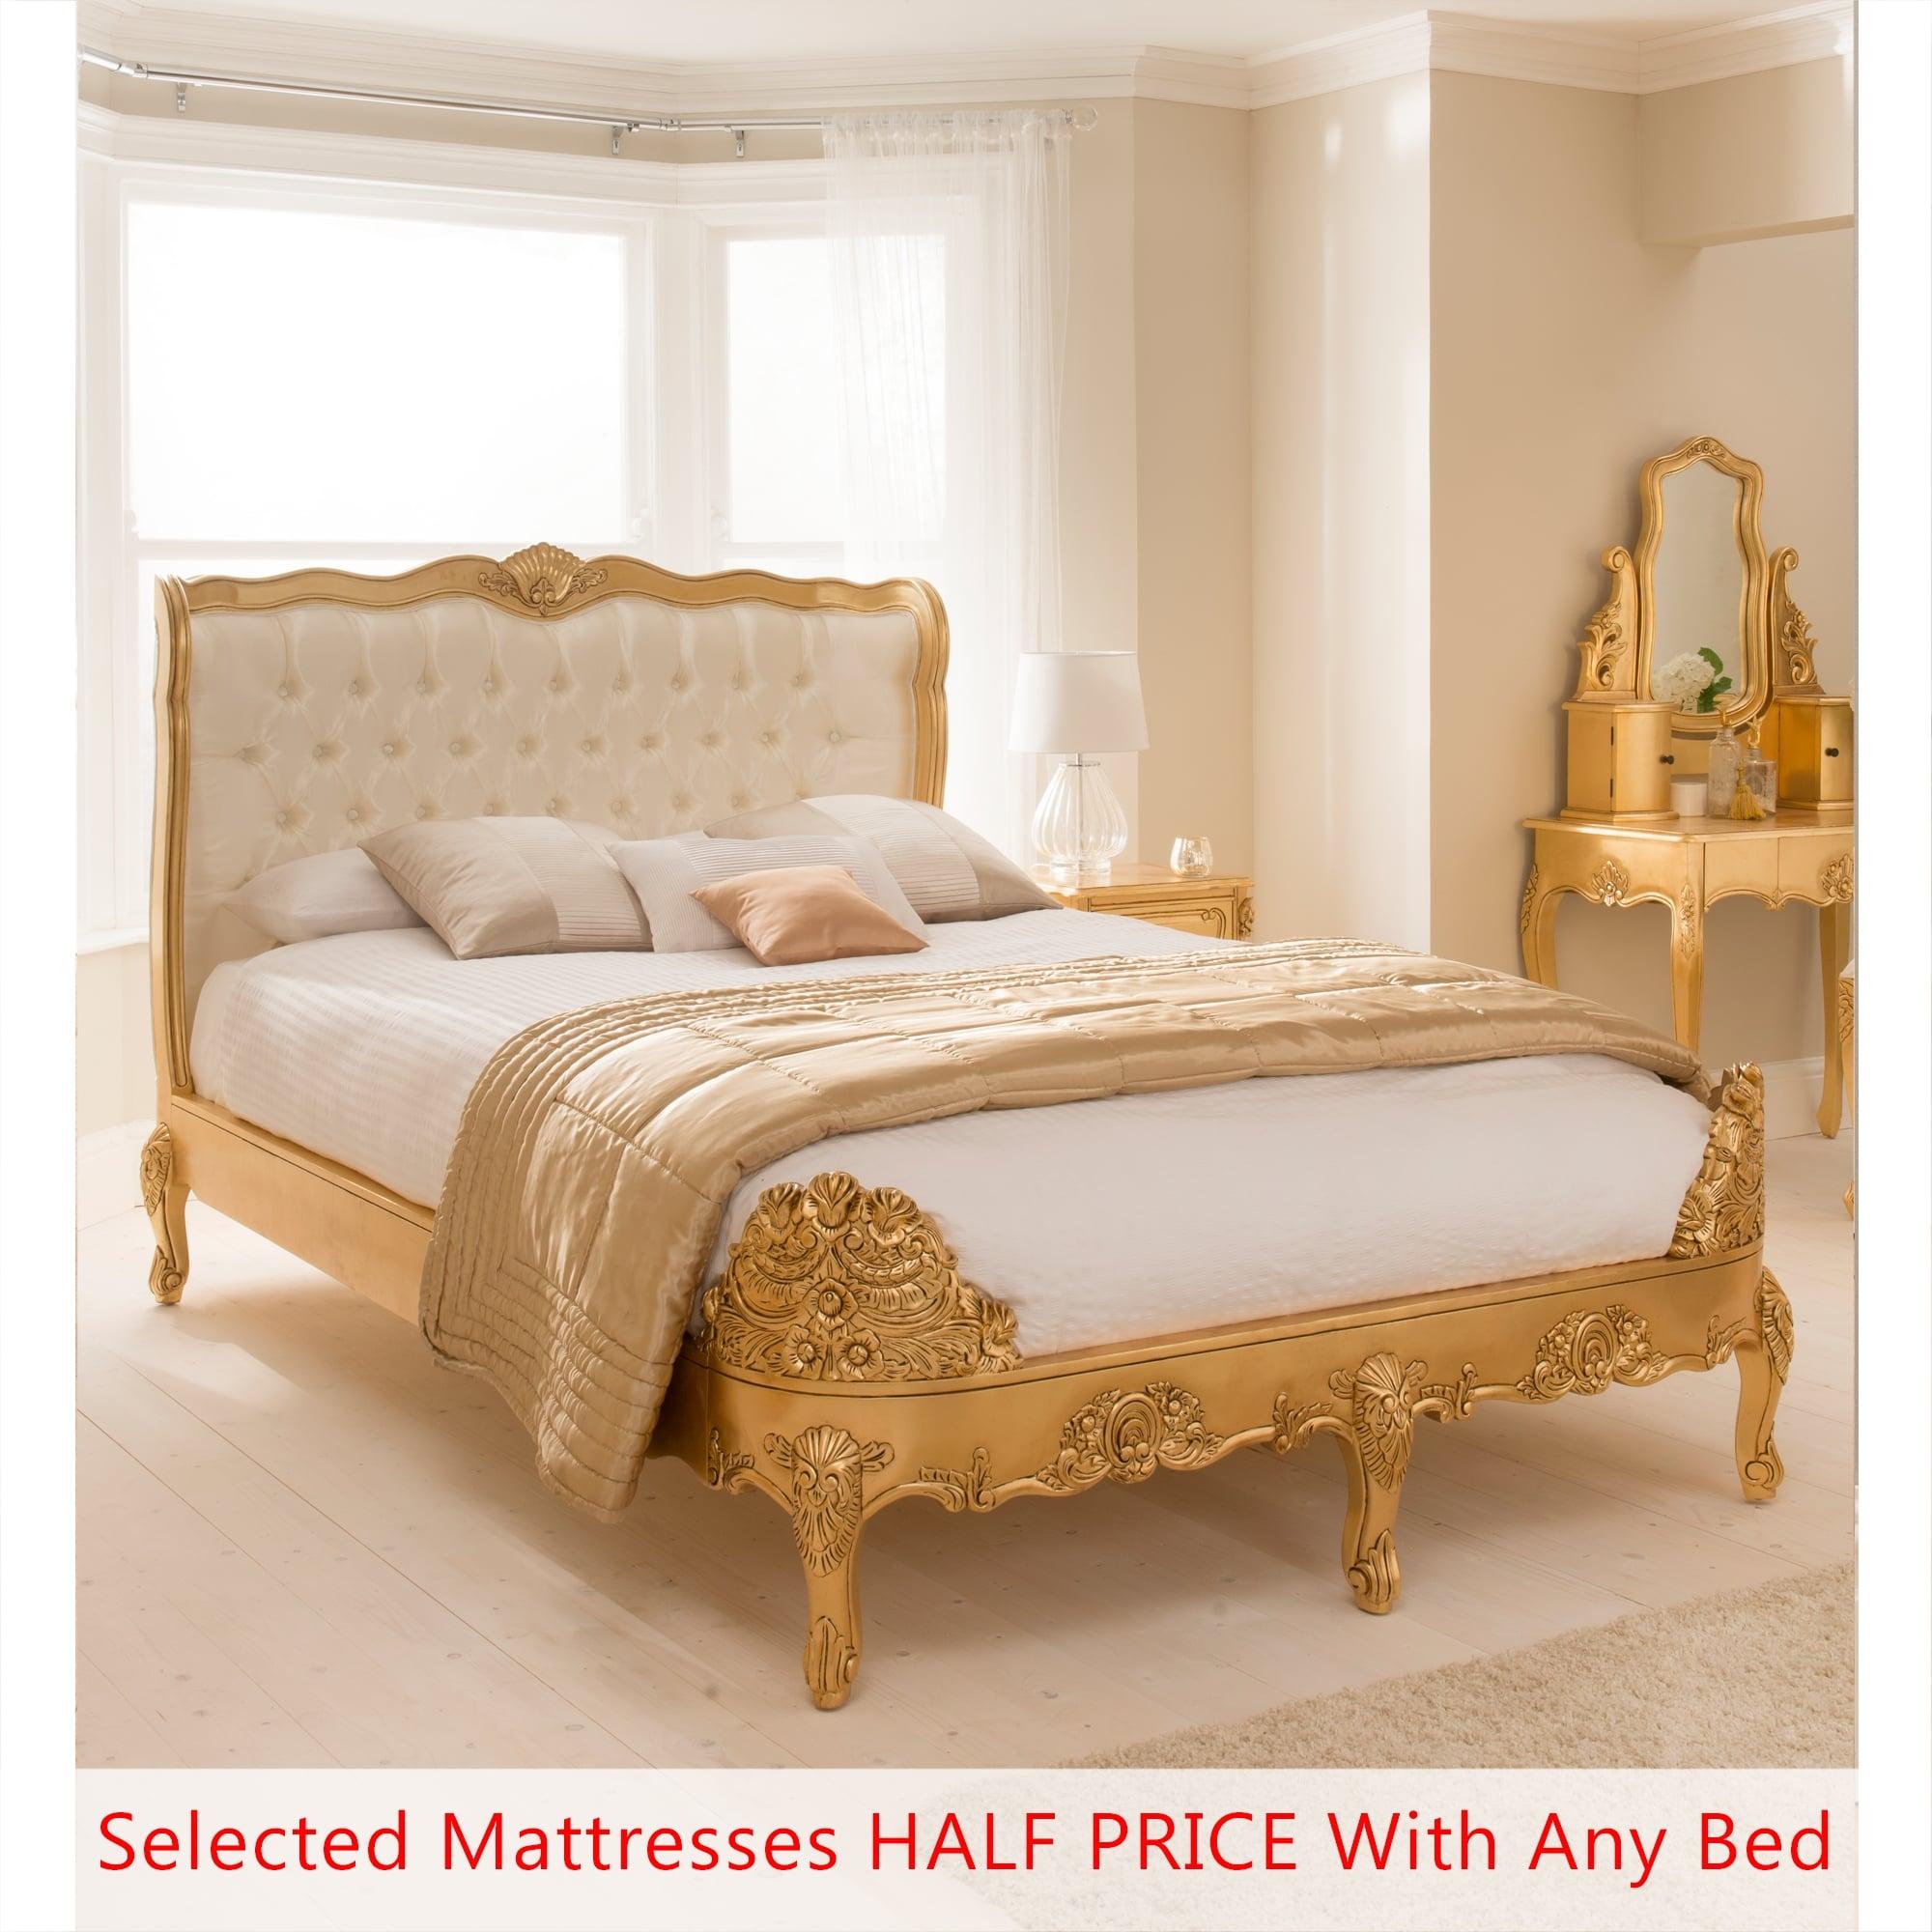 adjustable mattress king bed allow frame pin mattresses ikea furniture undredal sides bedroom